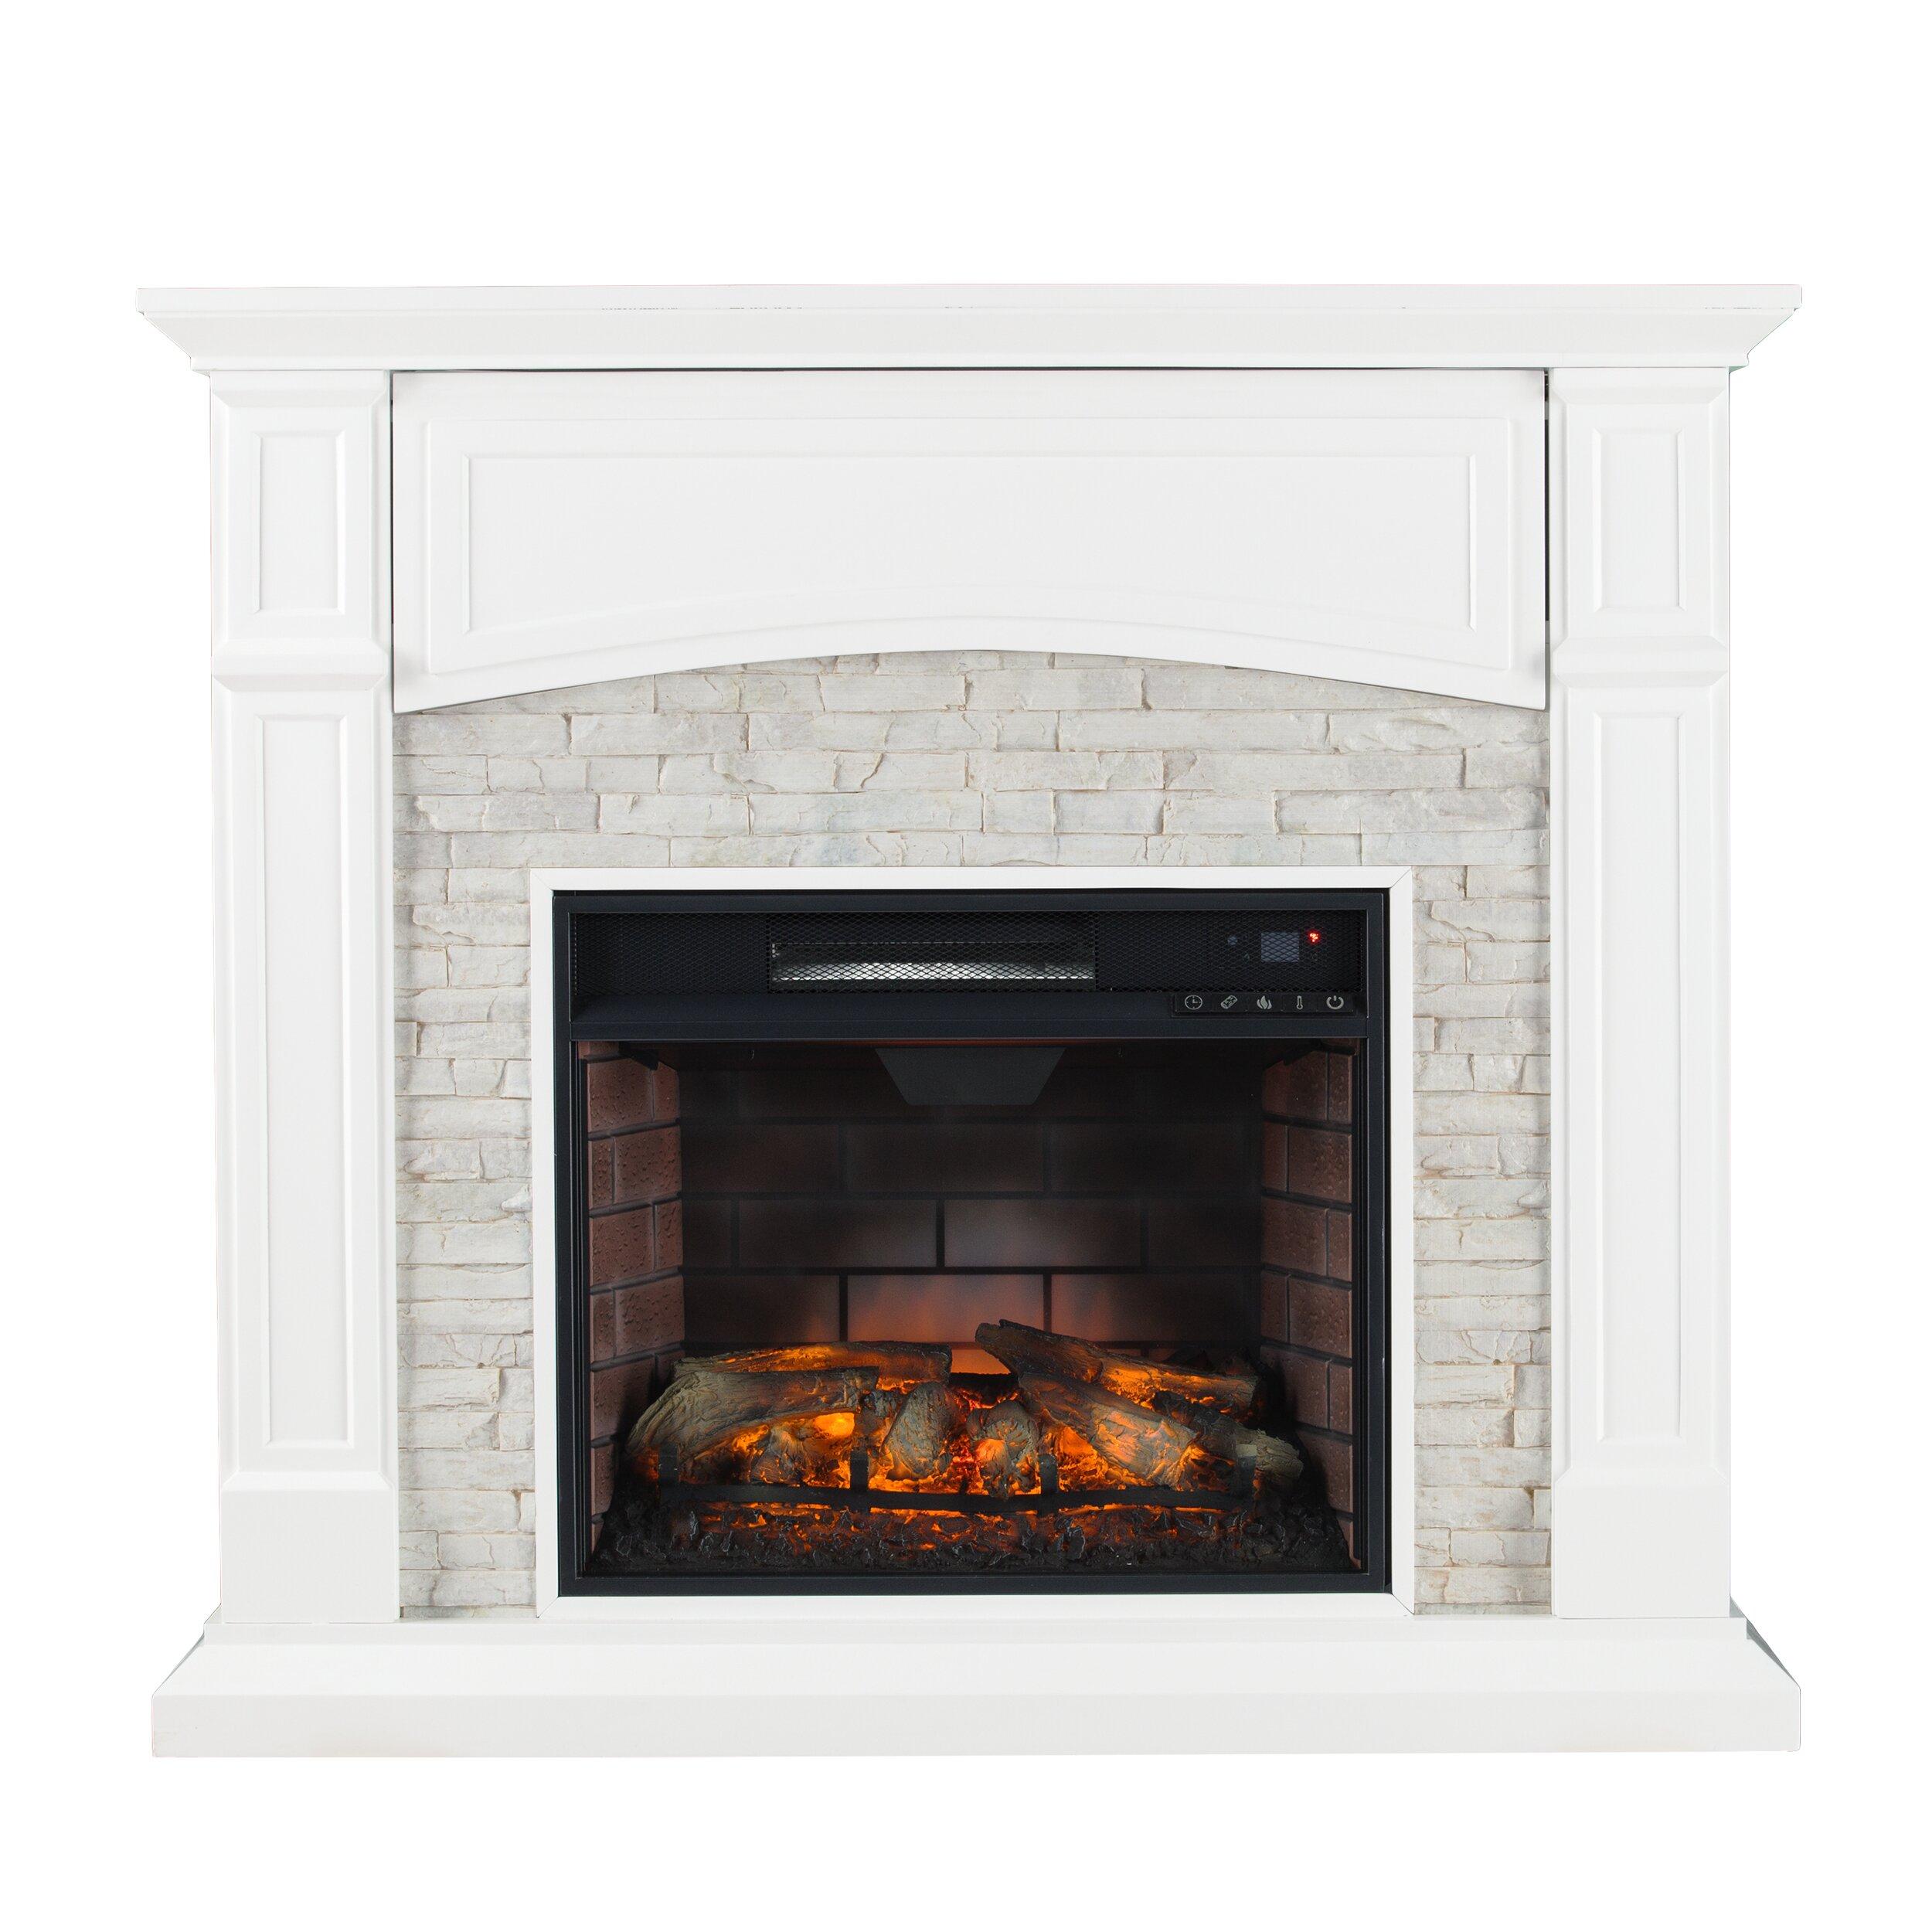 Wildon Home Sheldon Infrared Media Electric Fireplace Reviews Wayfair